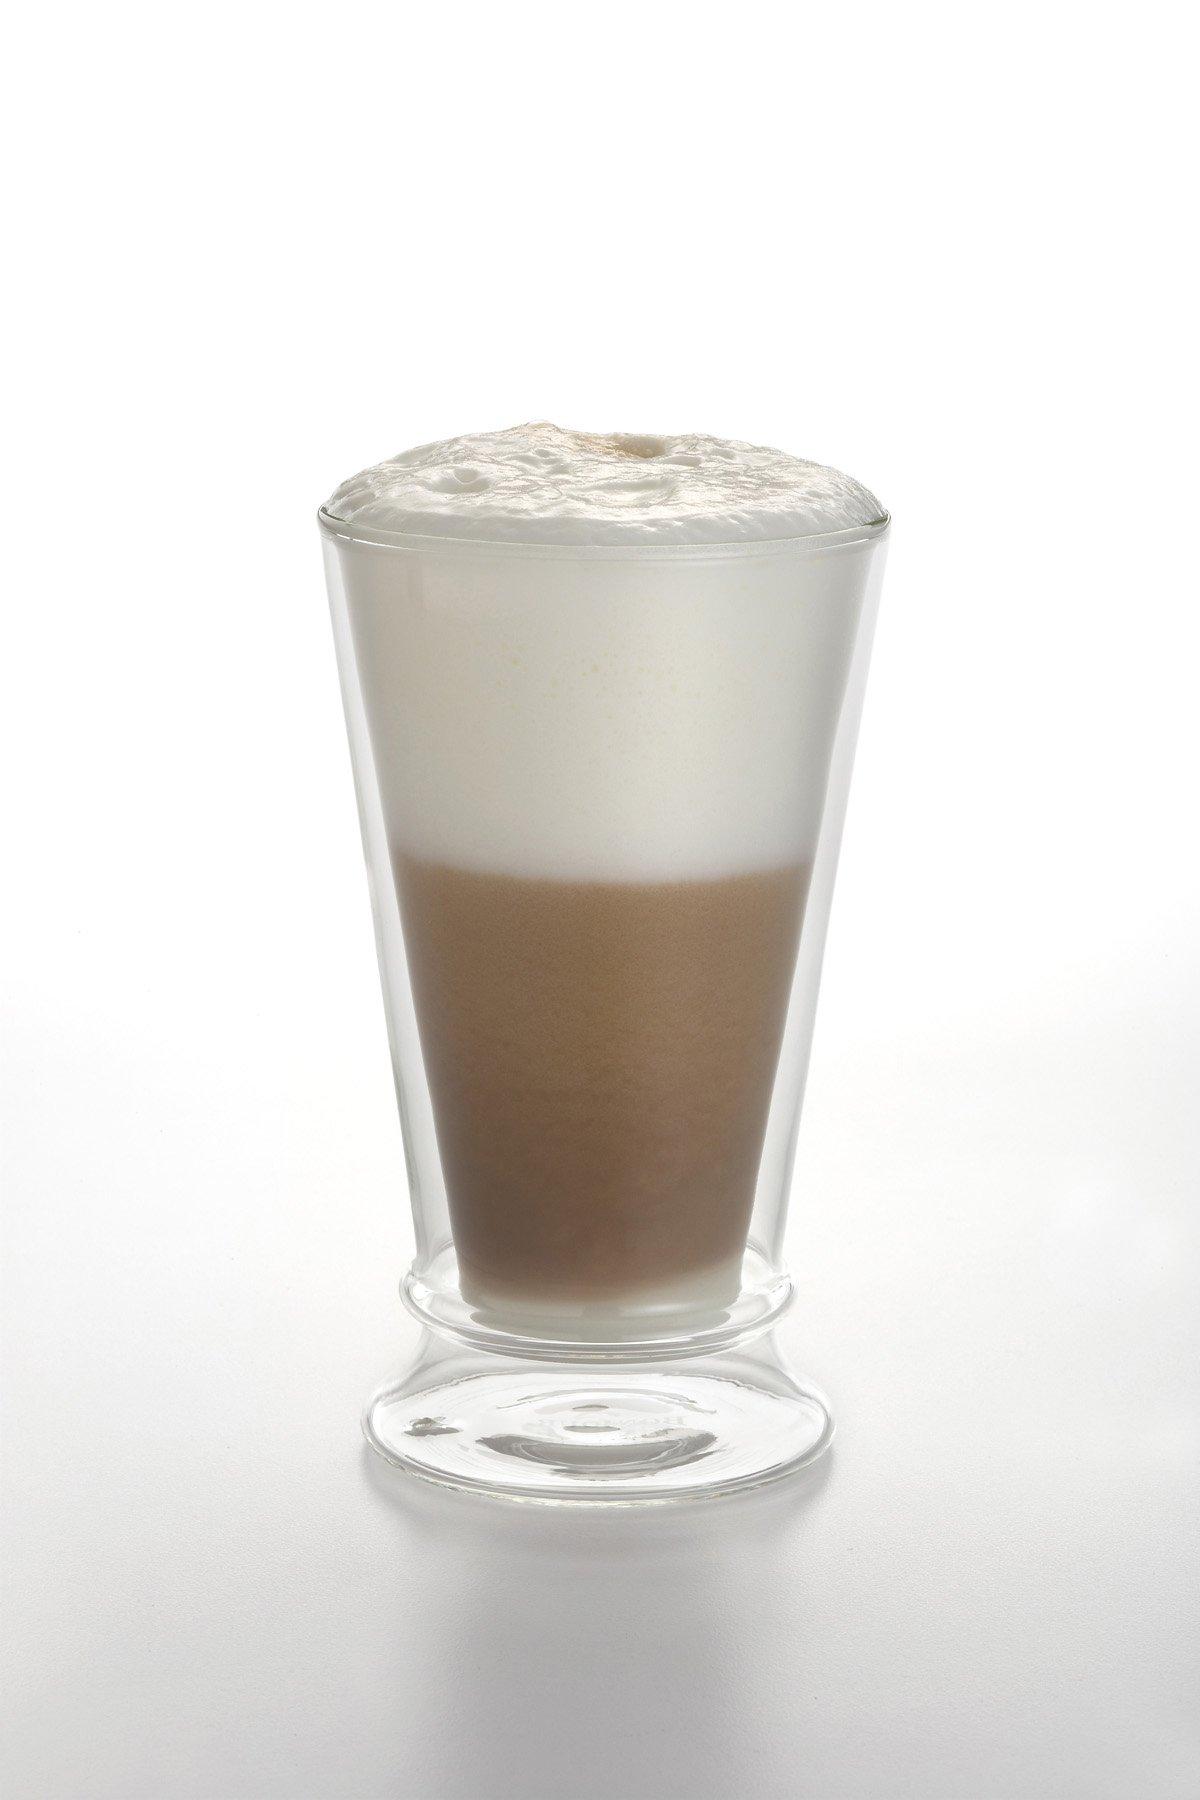 BonJour Coffee Insulated Borosilicate Glass Latte Glasses, 2-Piece Set, 12-Ounces Each